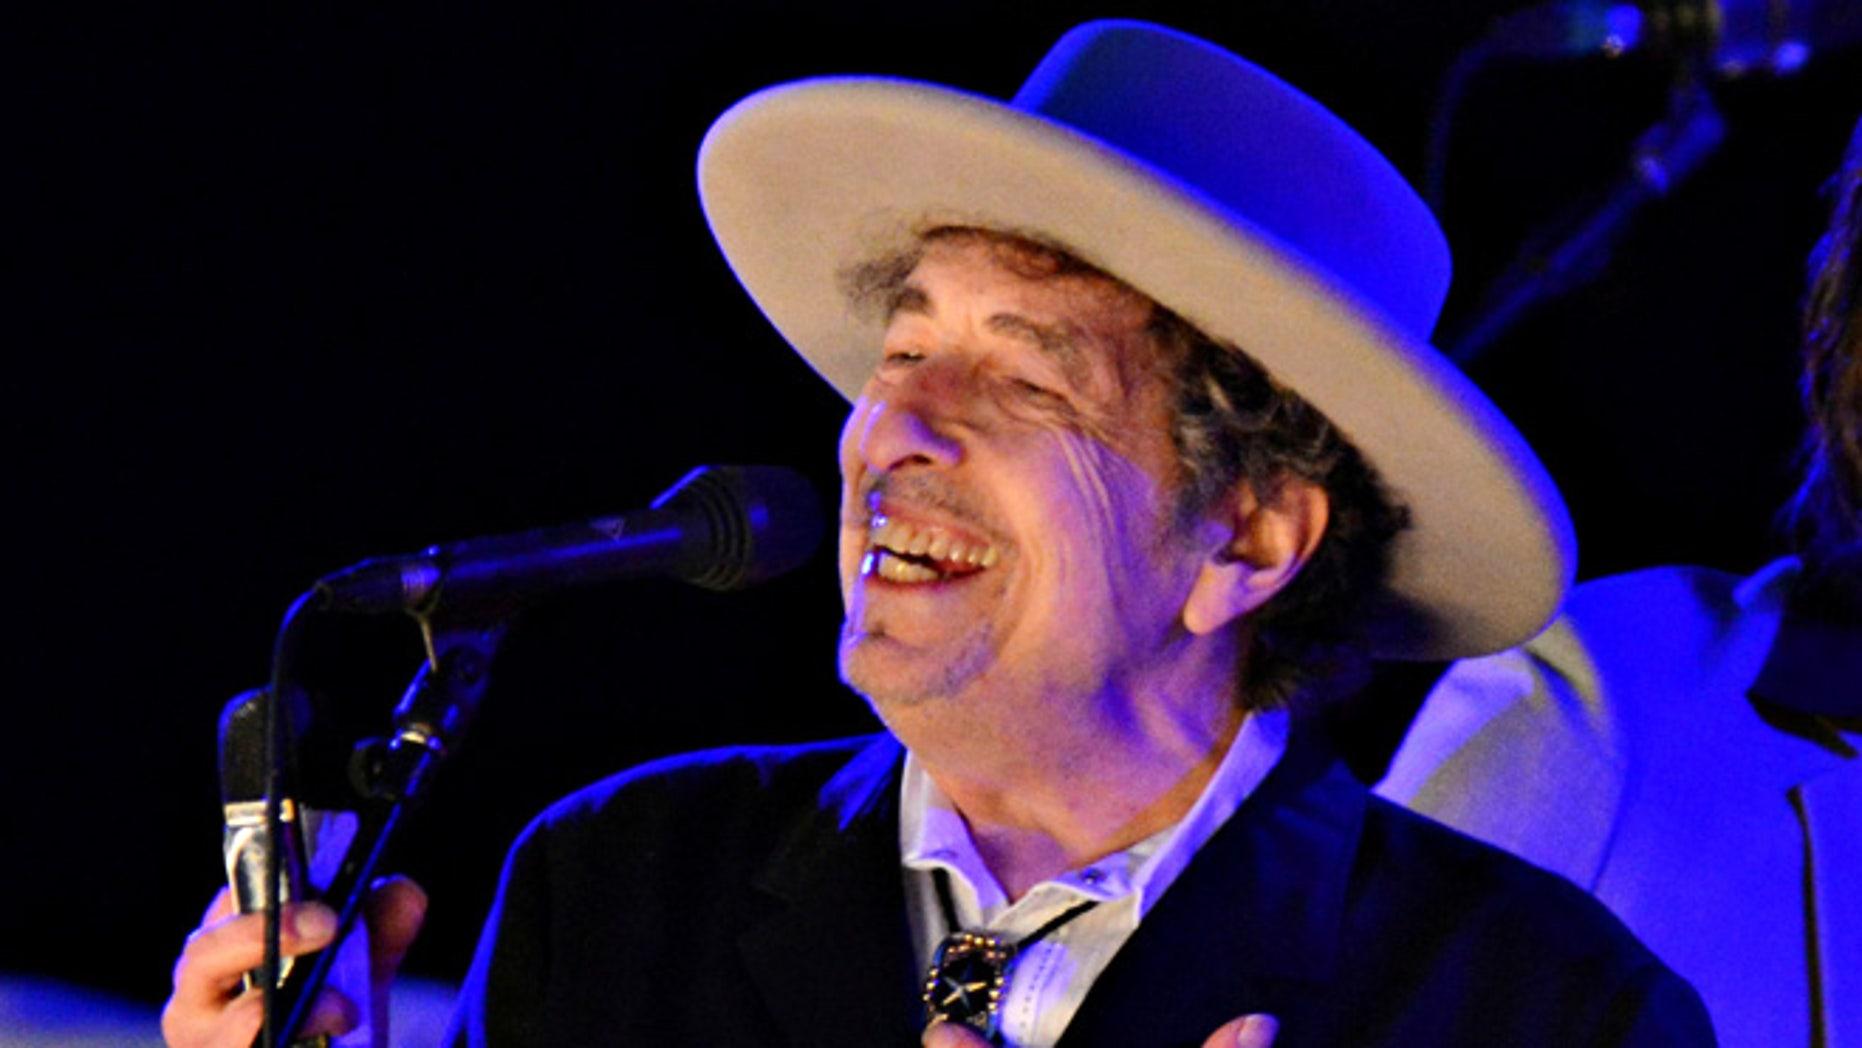 Bob Dylan has finally received his Nobel Prize.